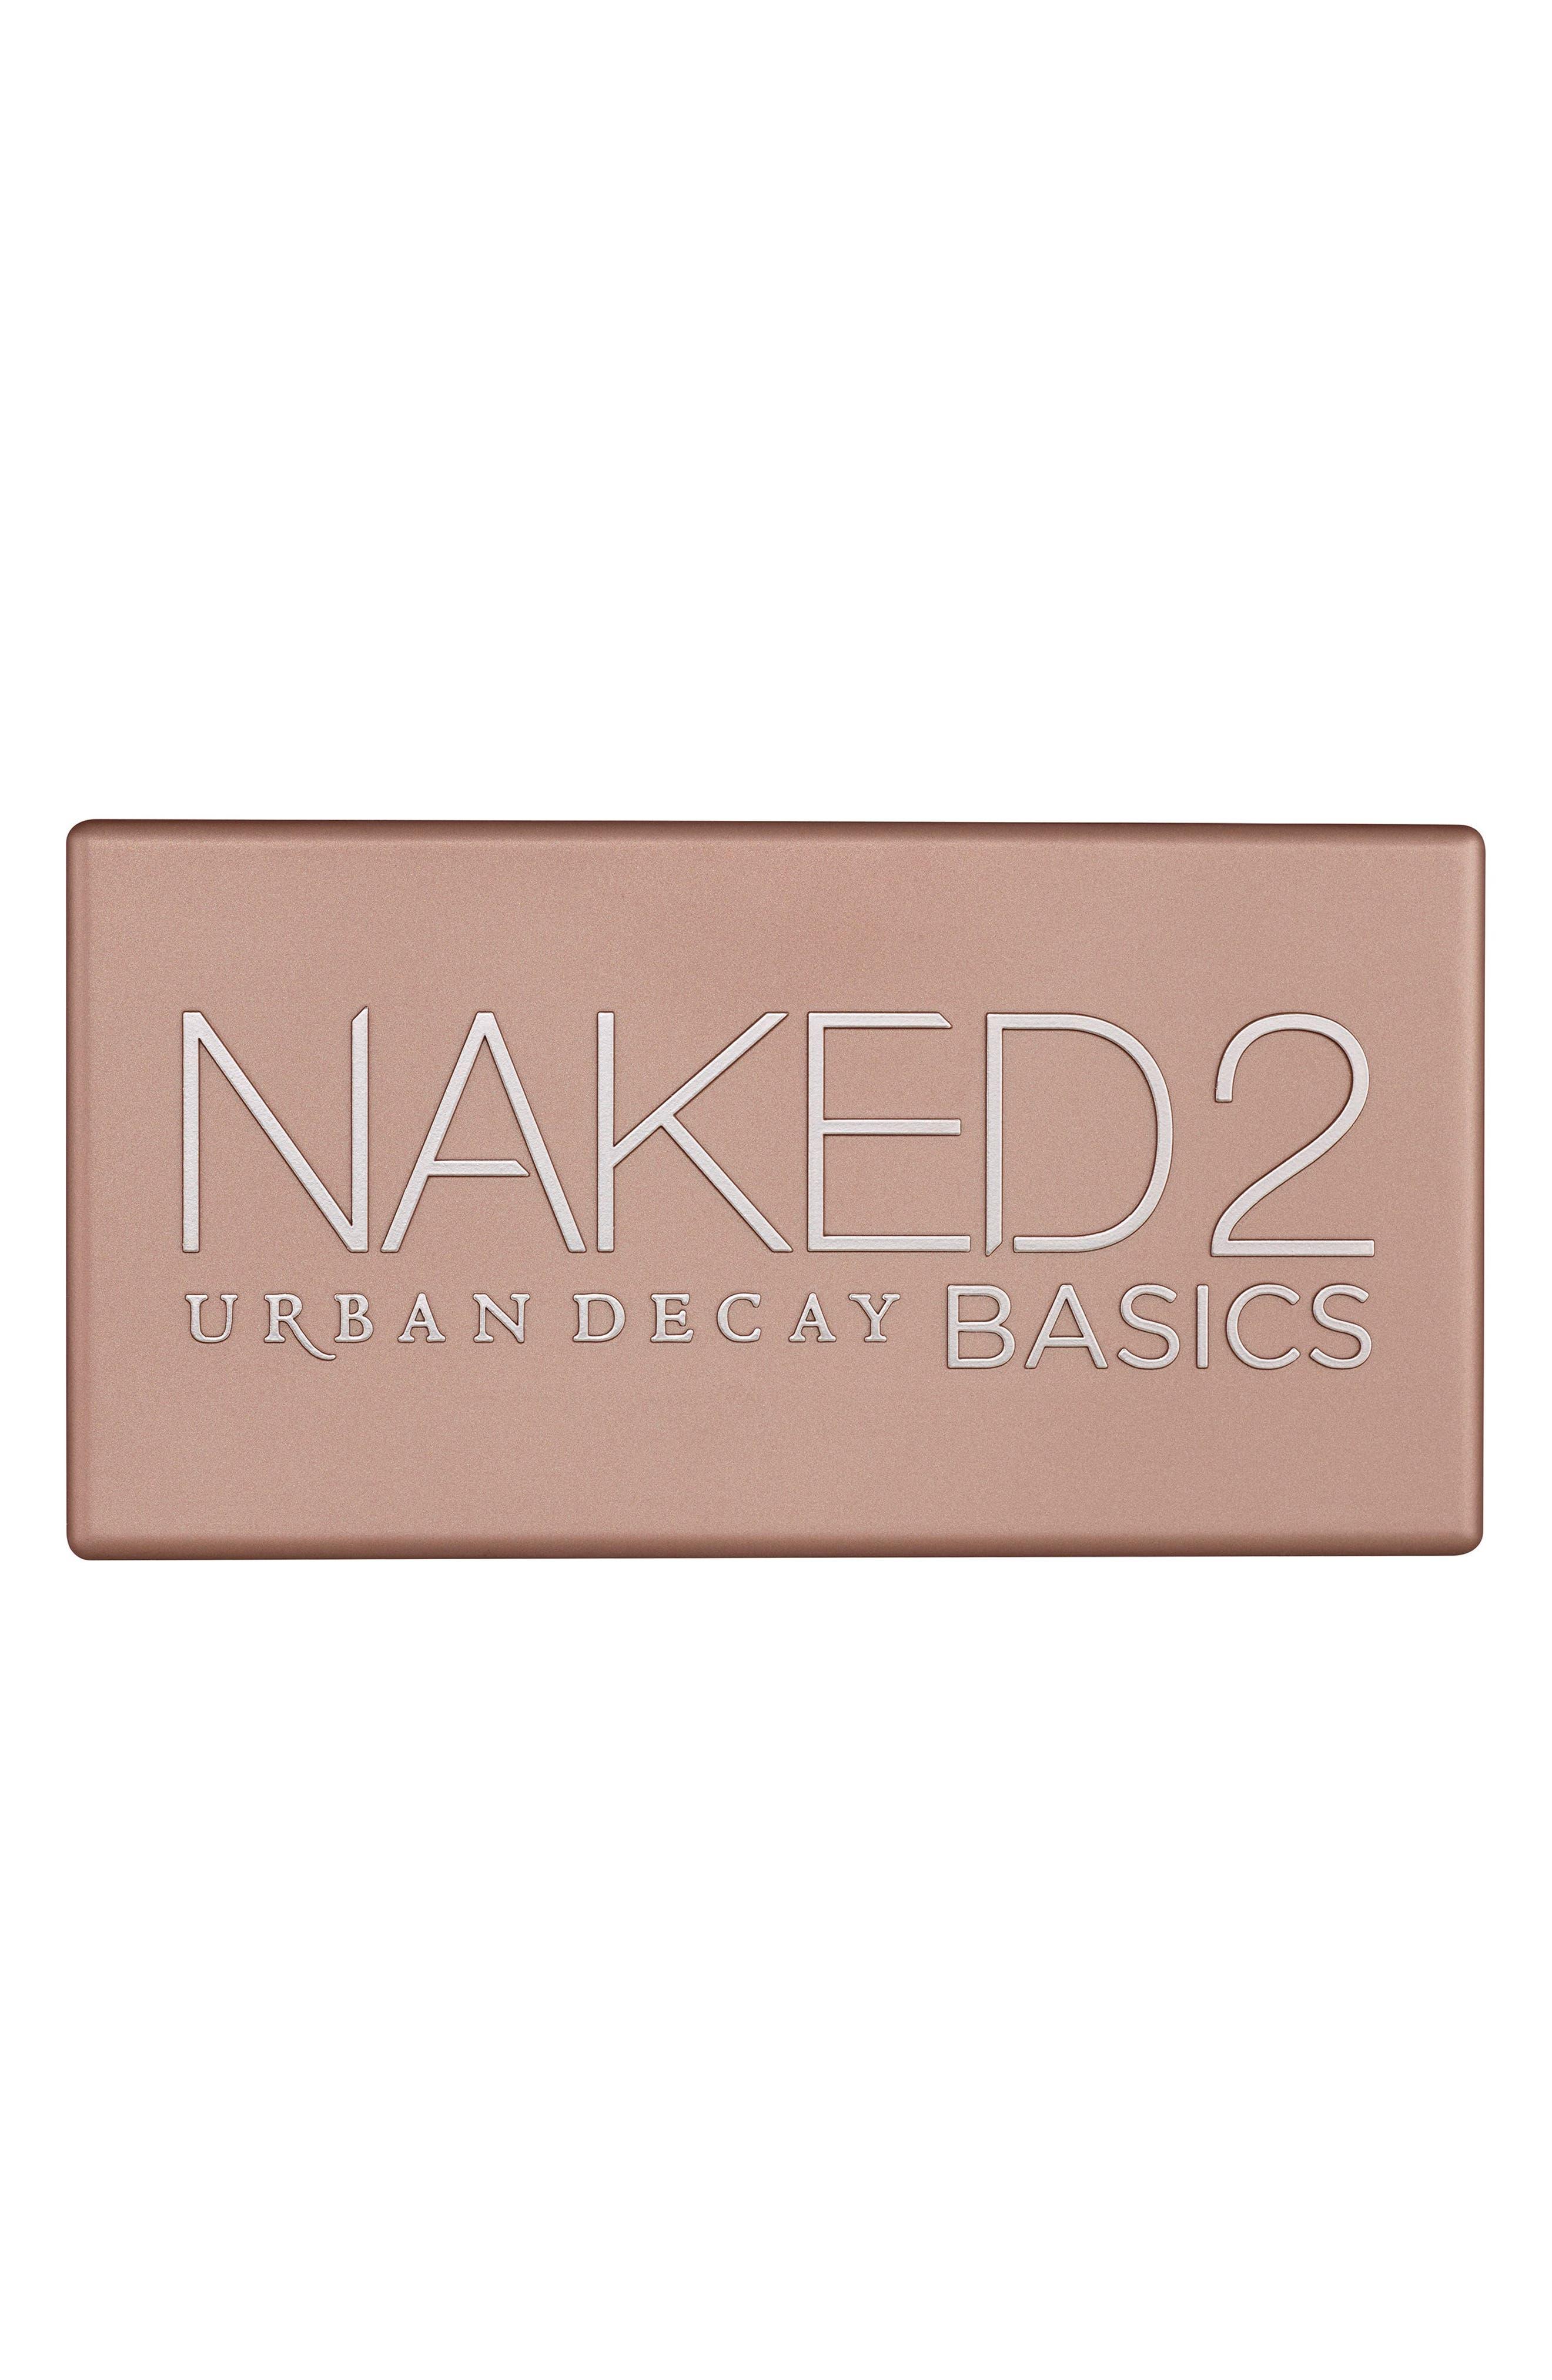 Naked2 Basics Set,                             Alternate thumbnail 6, color,                             NO COLOR